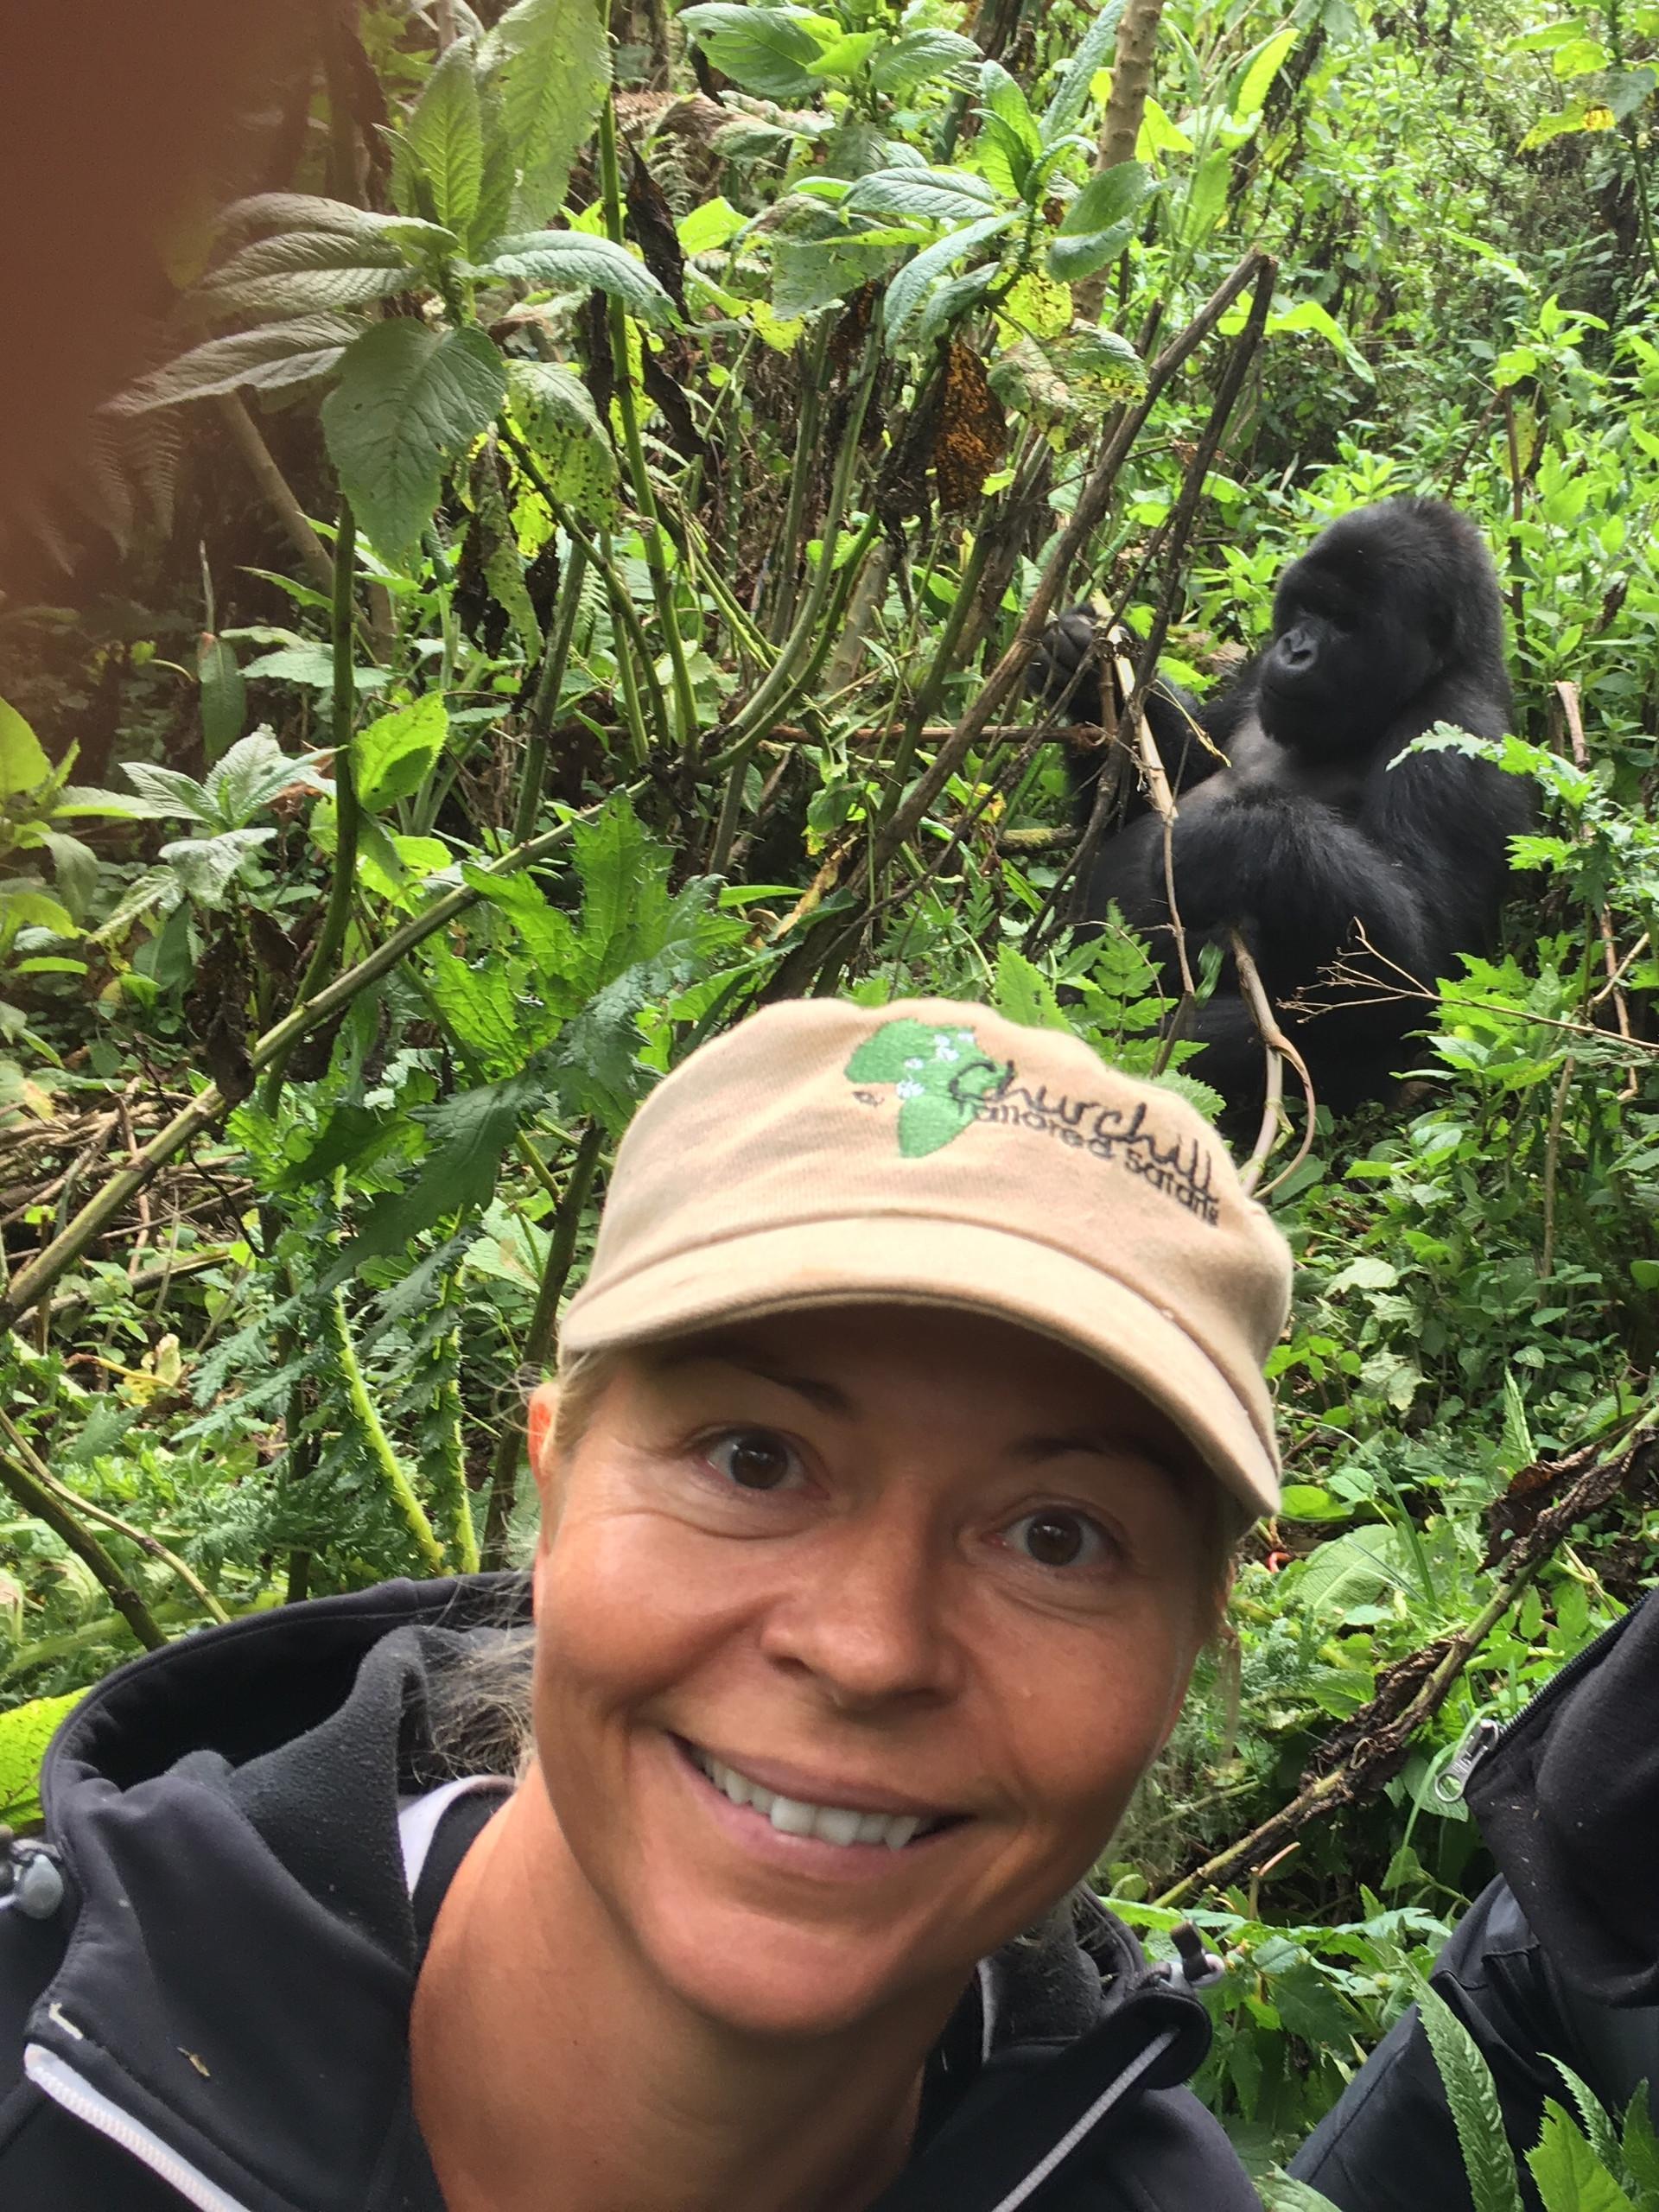 Begegnung mit Berggorillas in Uganda